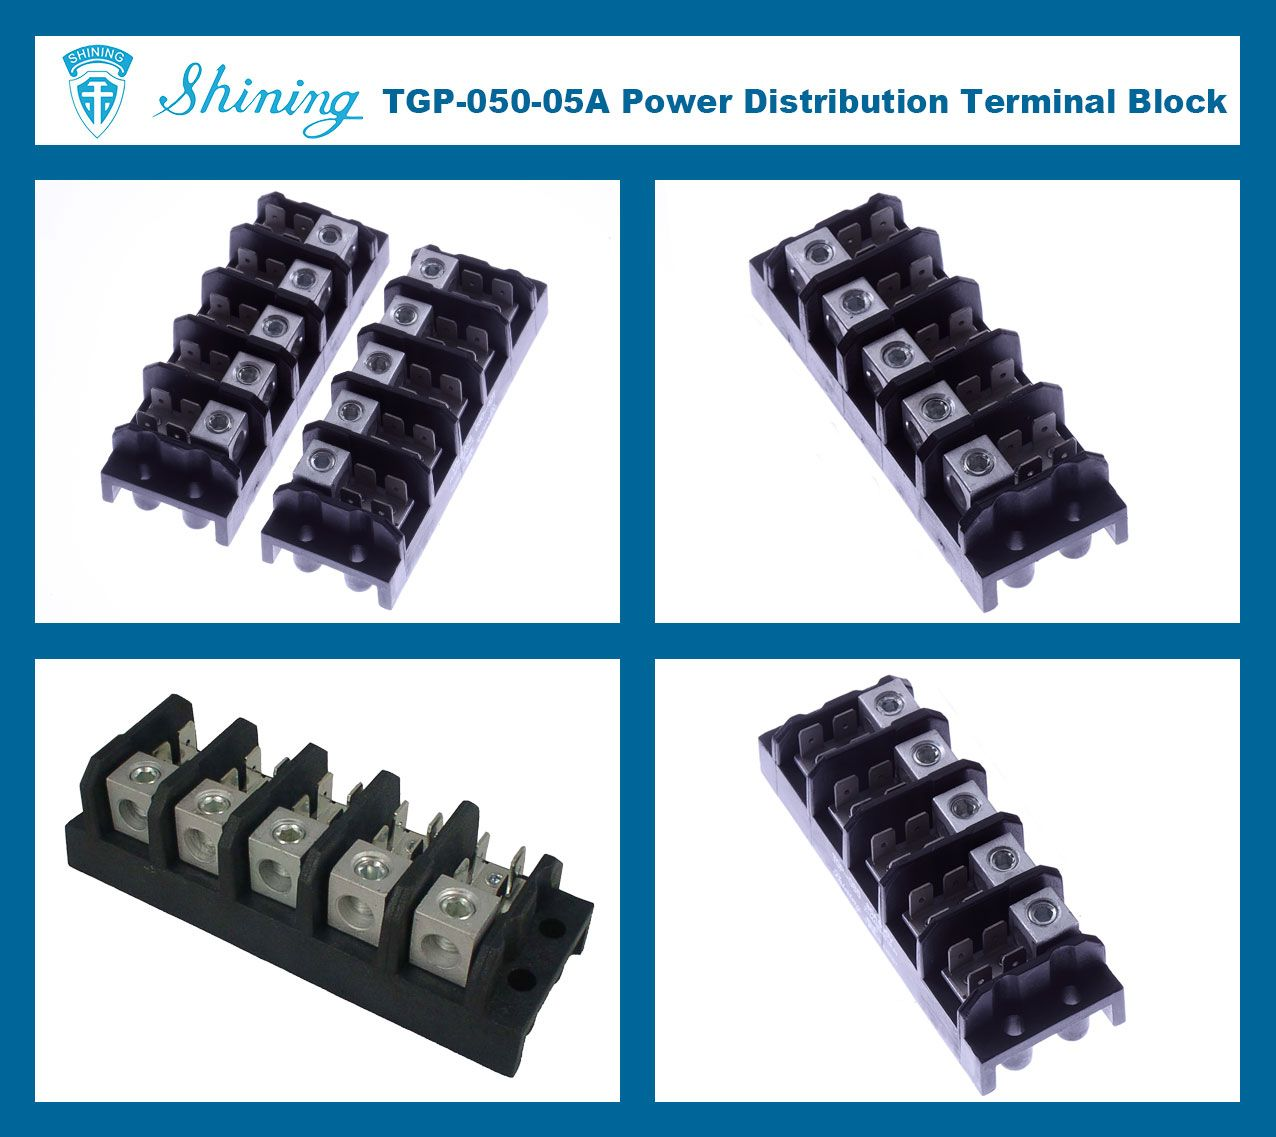 TGP-050-05A 600V 50A 5 Pole Electrical Power Terminal Block